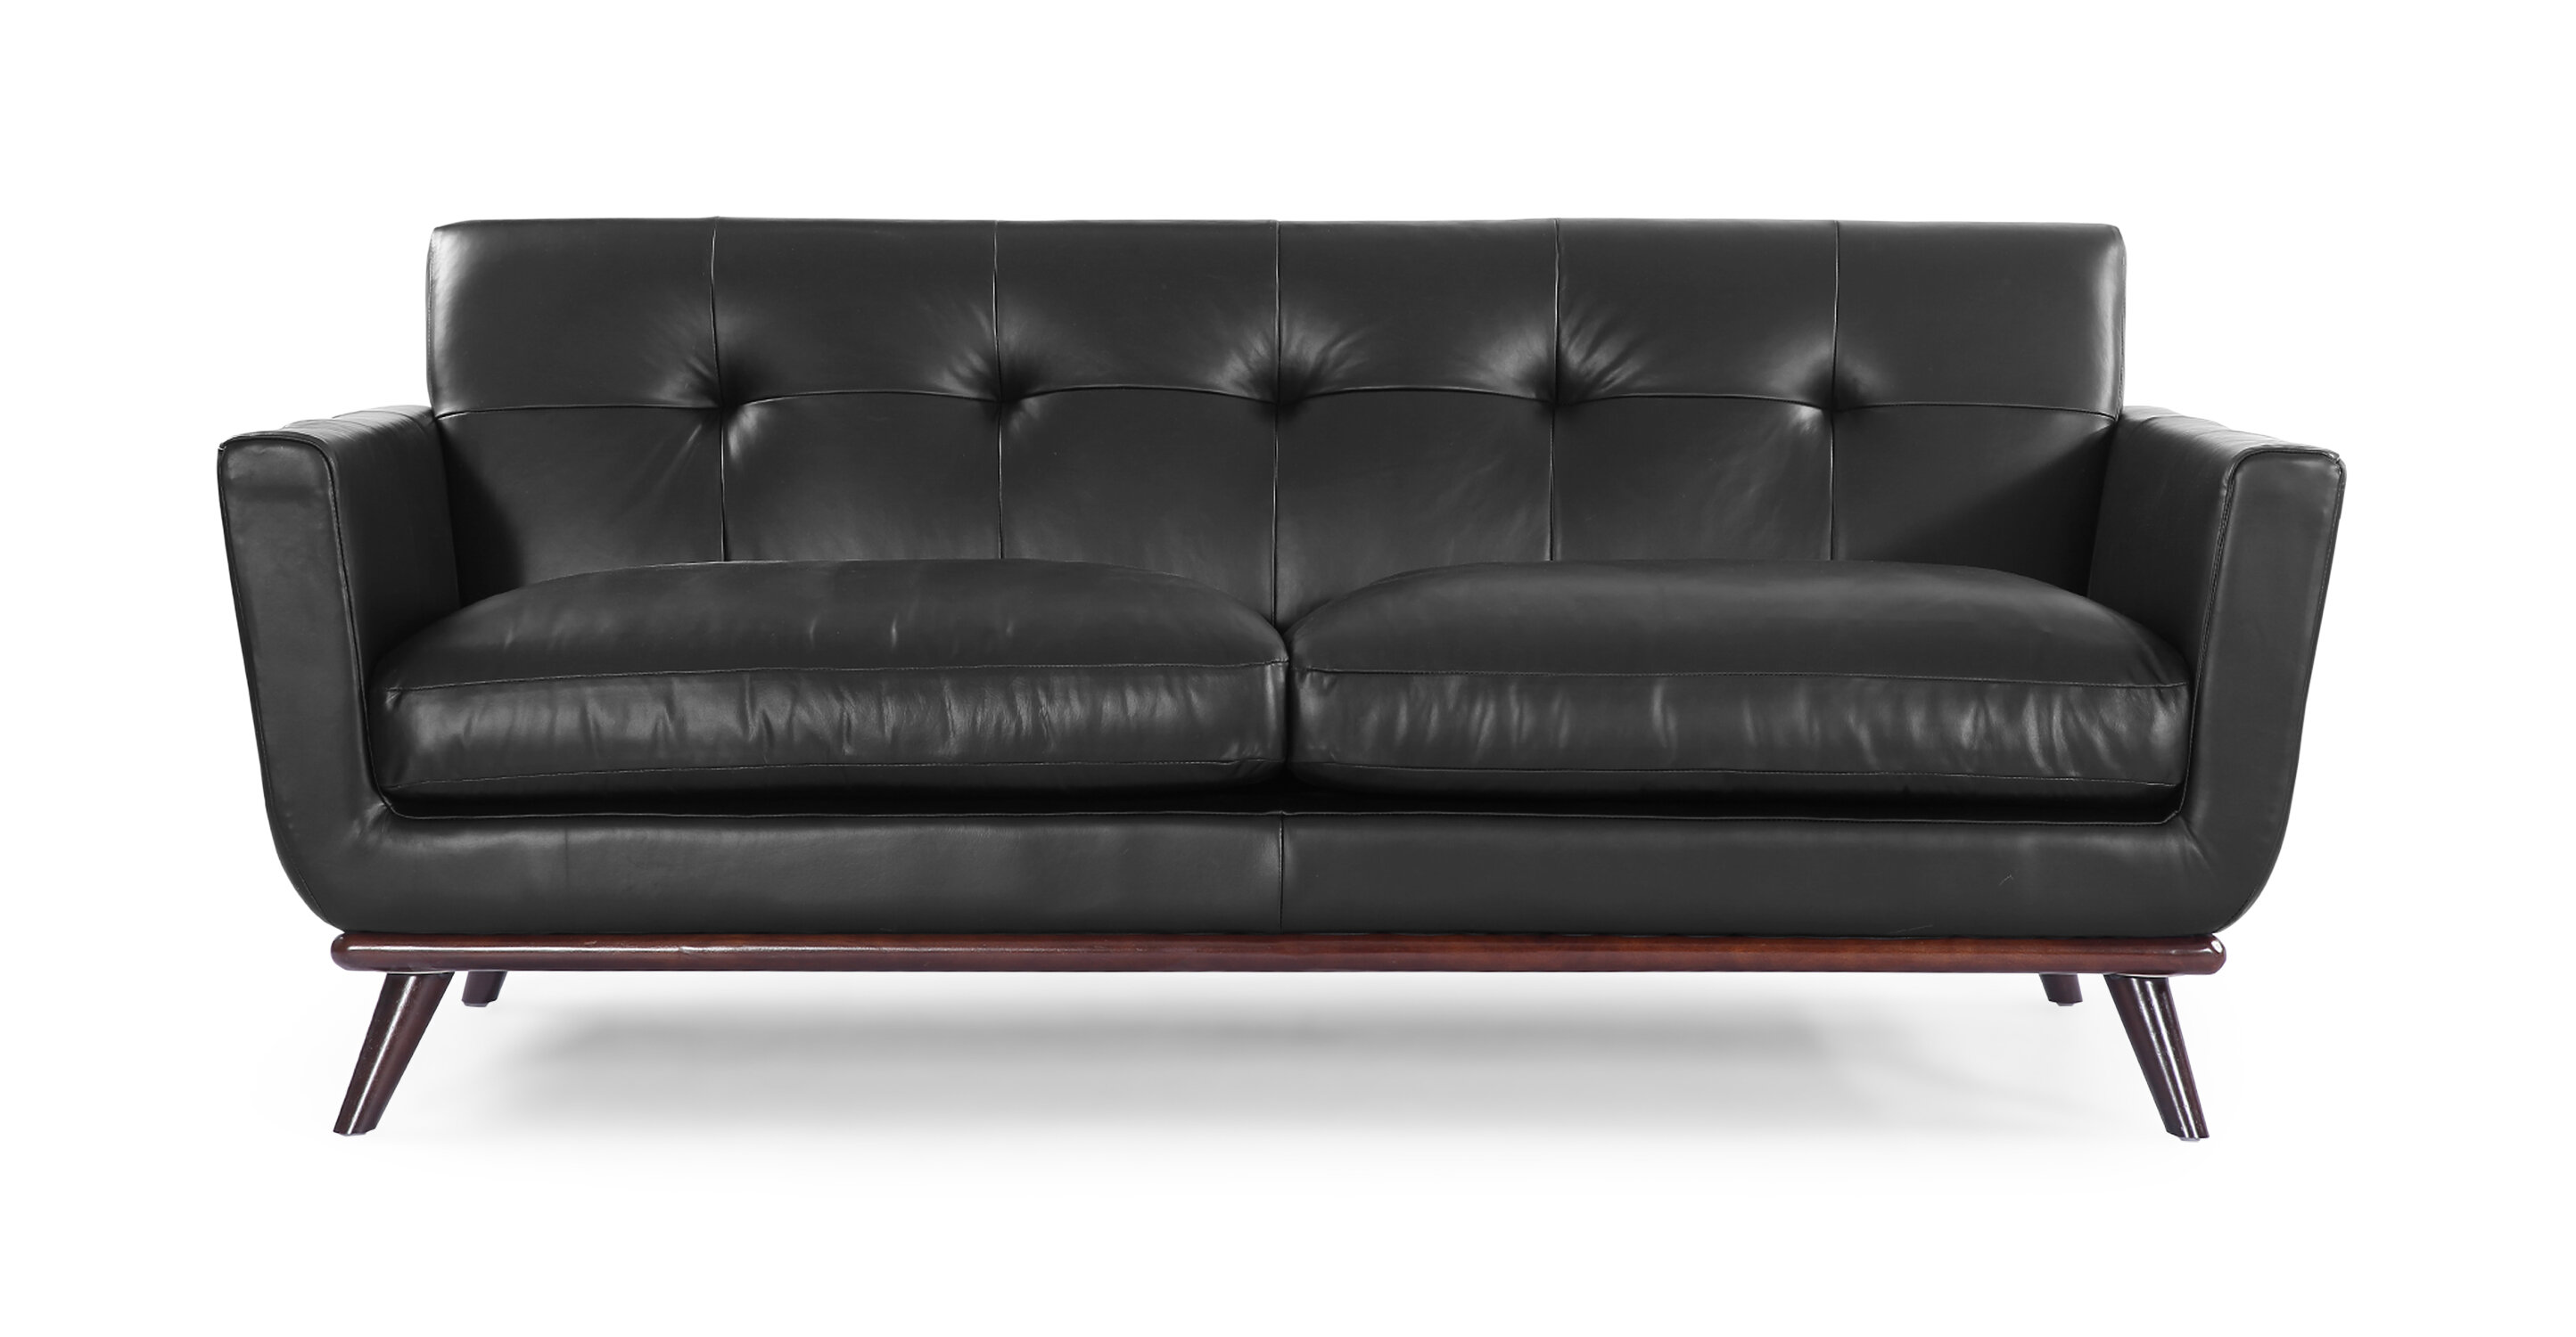 mid century modern leather sofa. Mid Century Modern Leather Sofa E